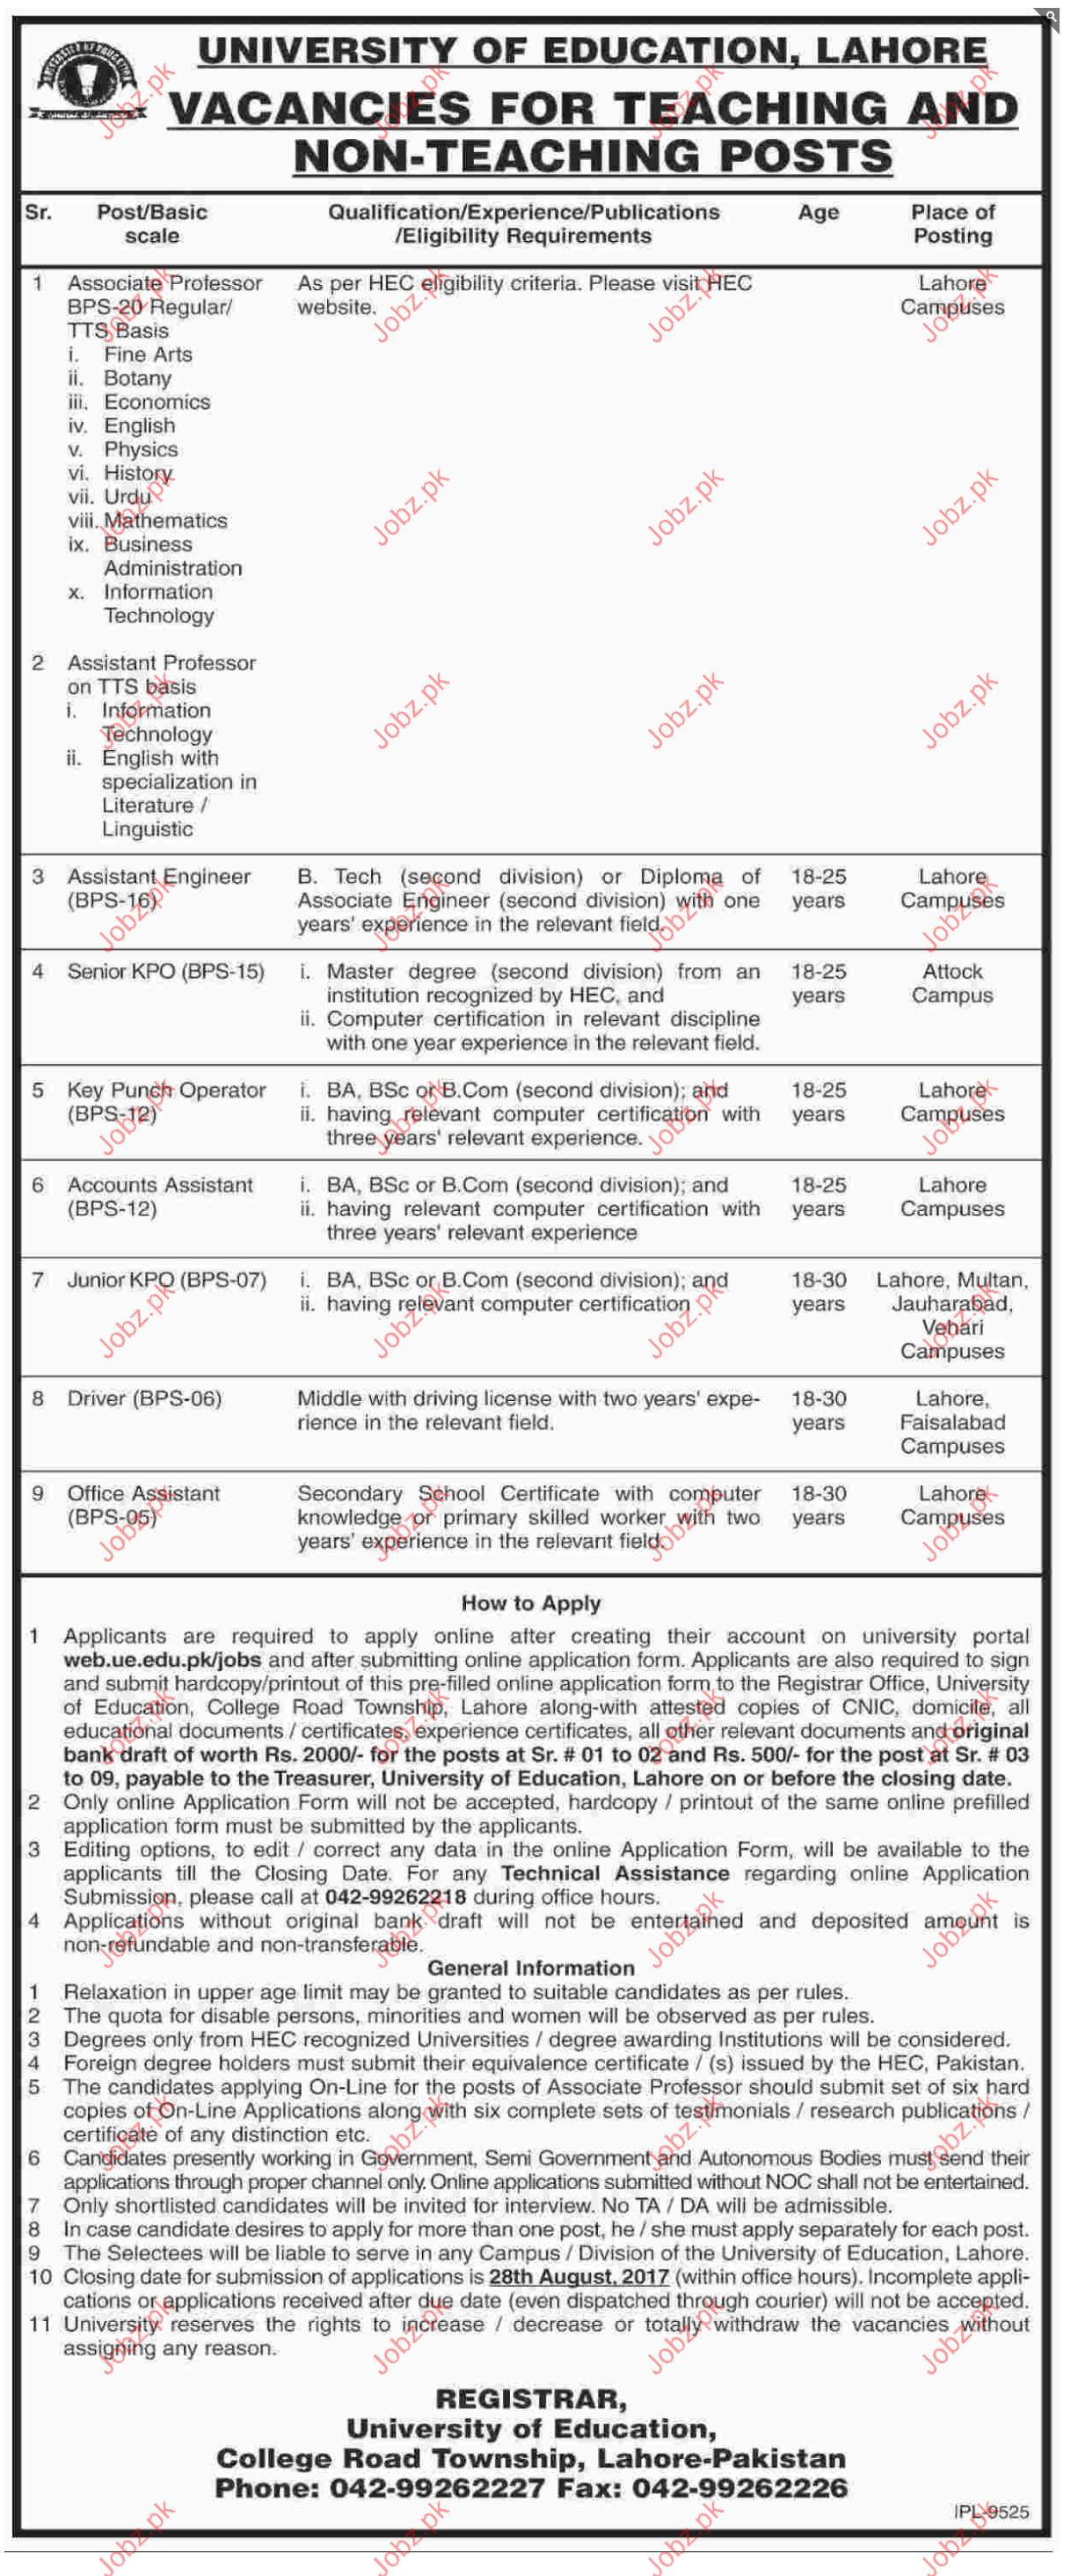 University Of Education, Lahore Jobs